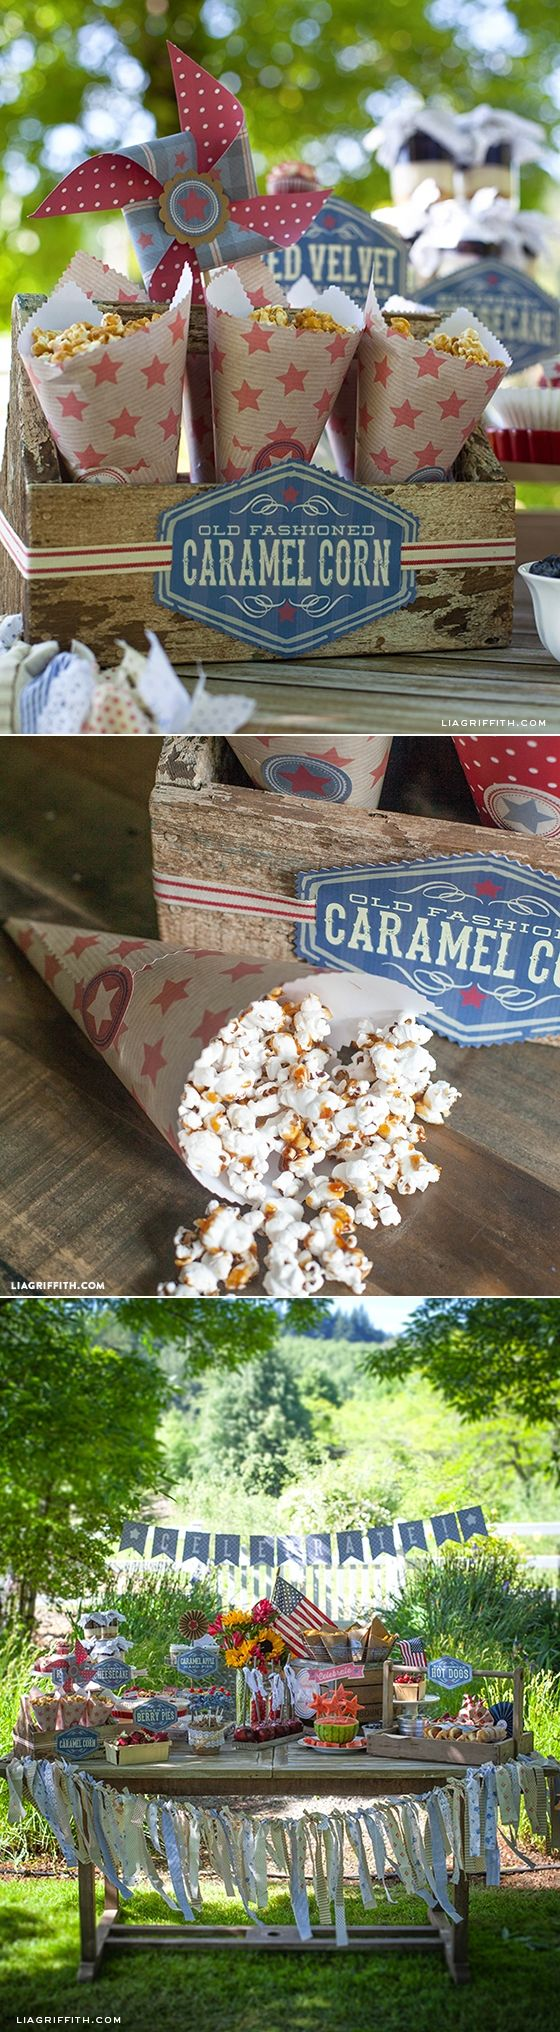 Old Fashioned Caramel Corn